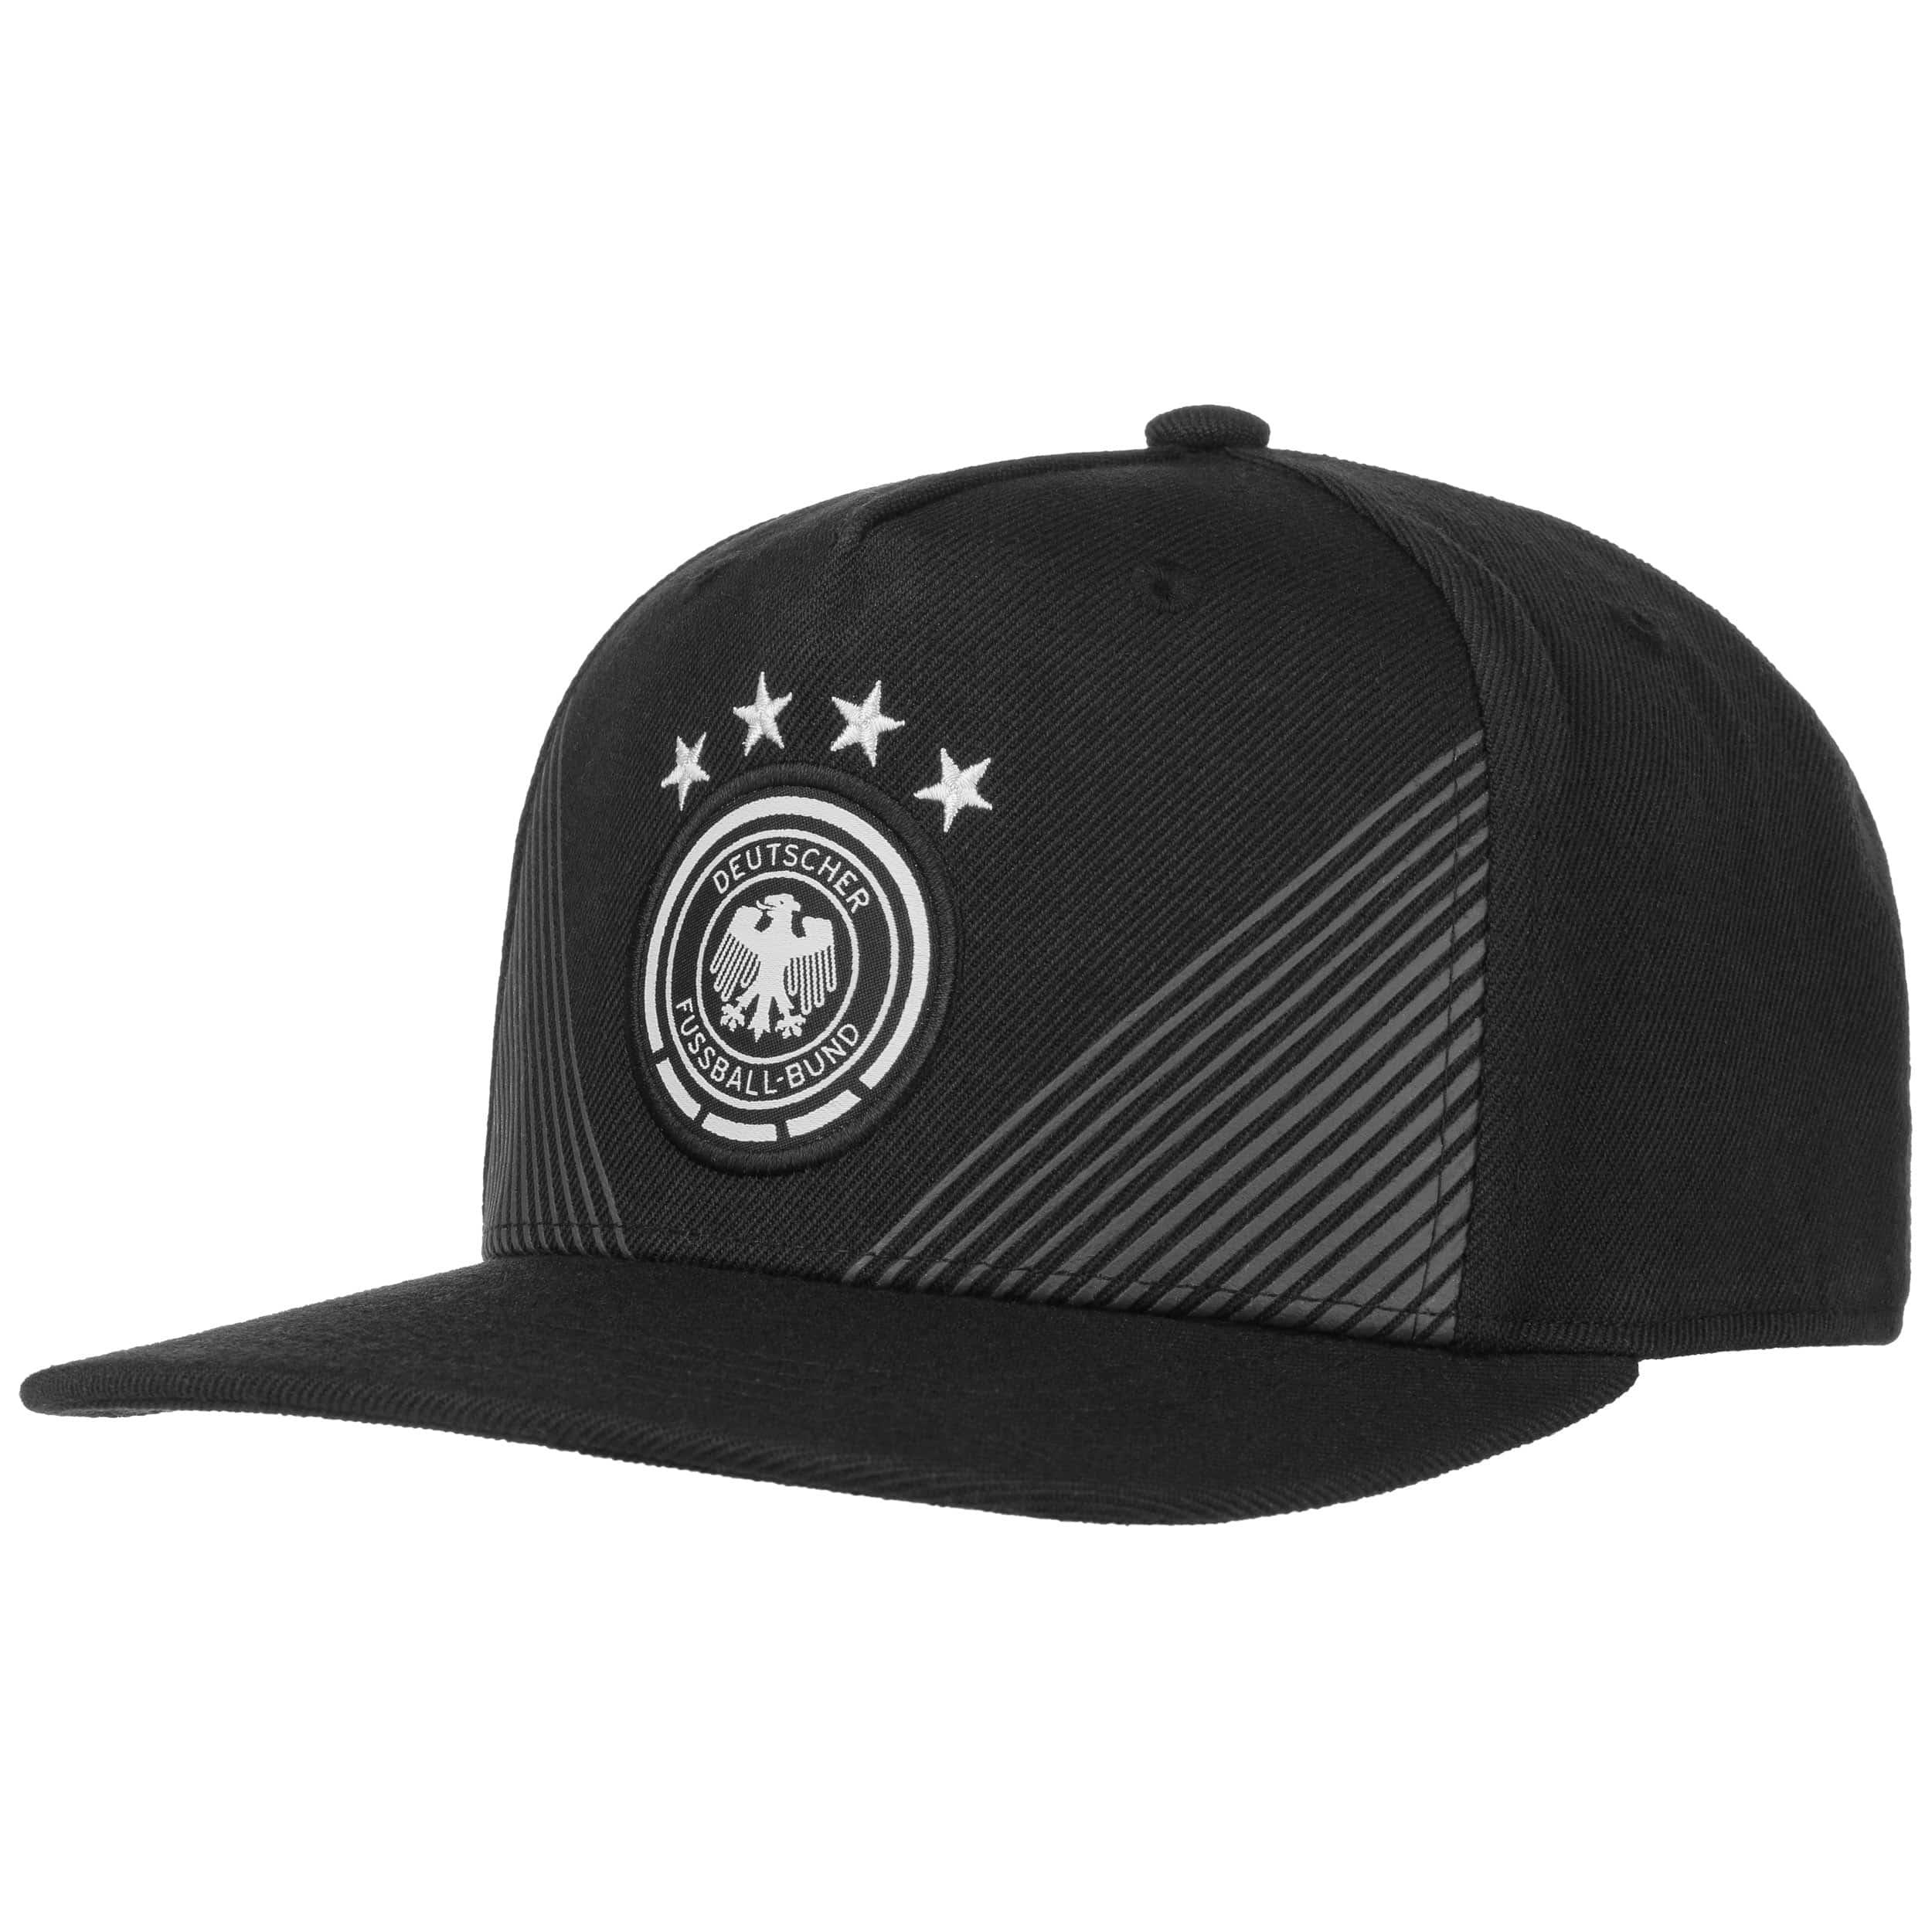 8a36d66699e ... DFB Home Snapback Cap by adidas - black 6